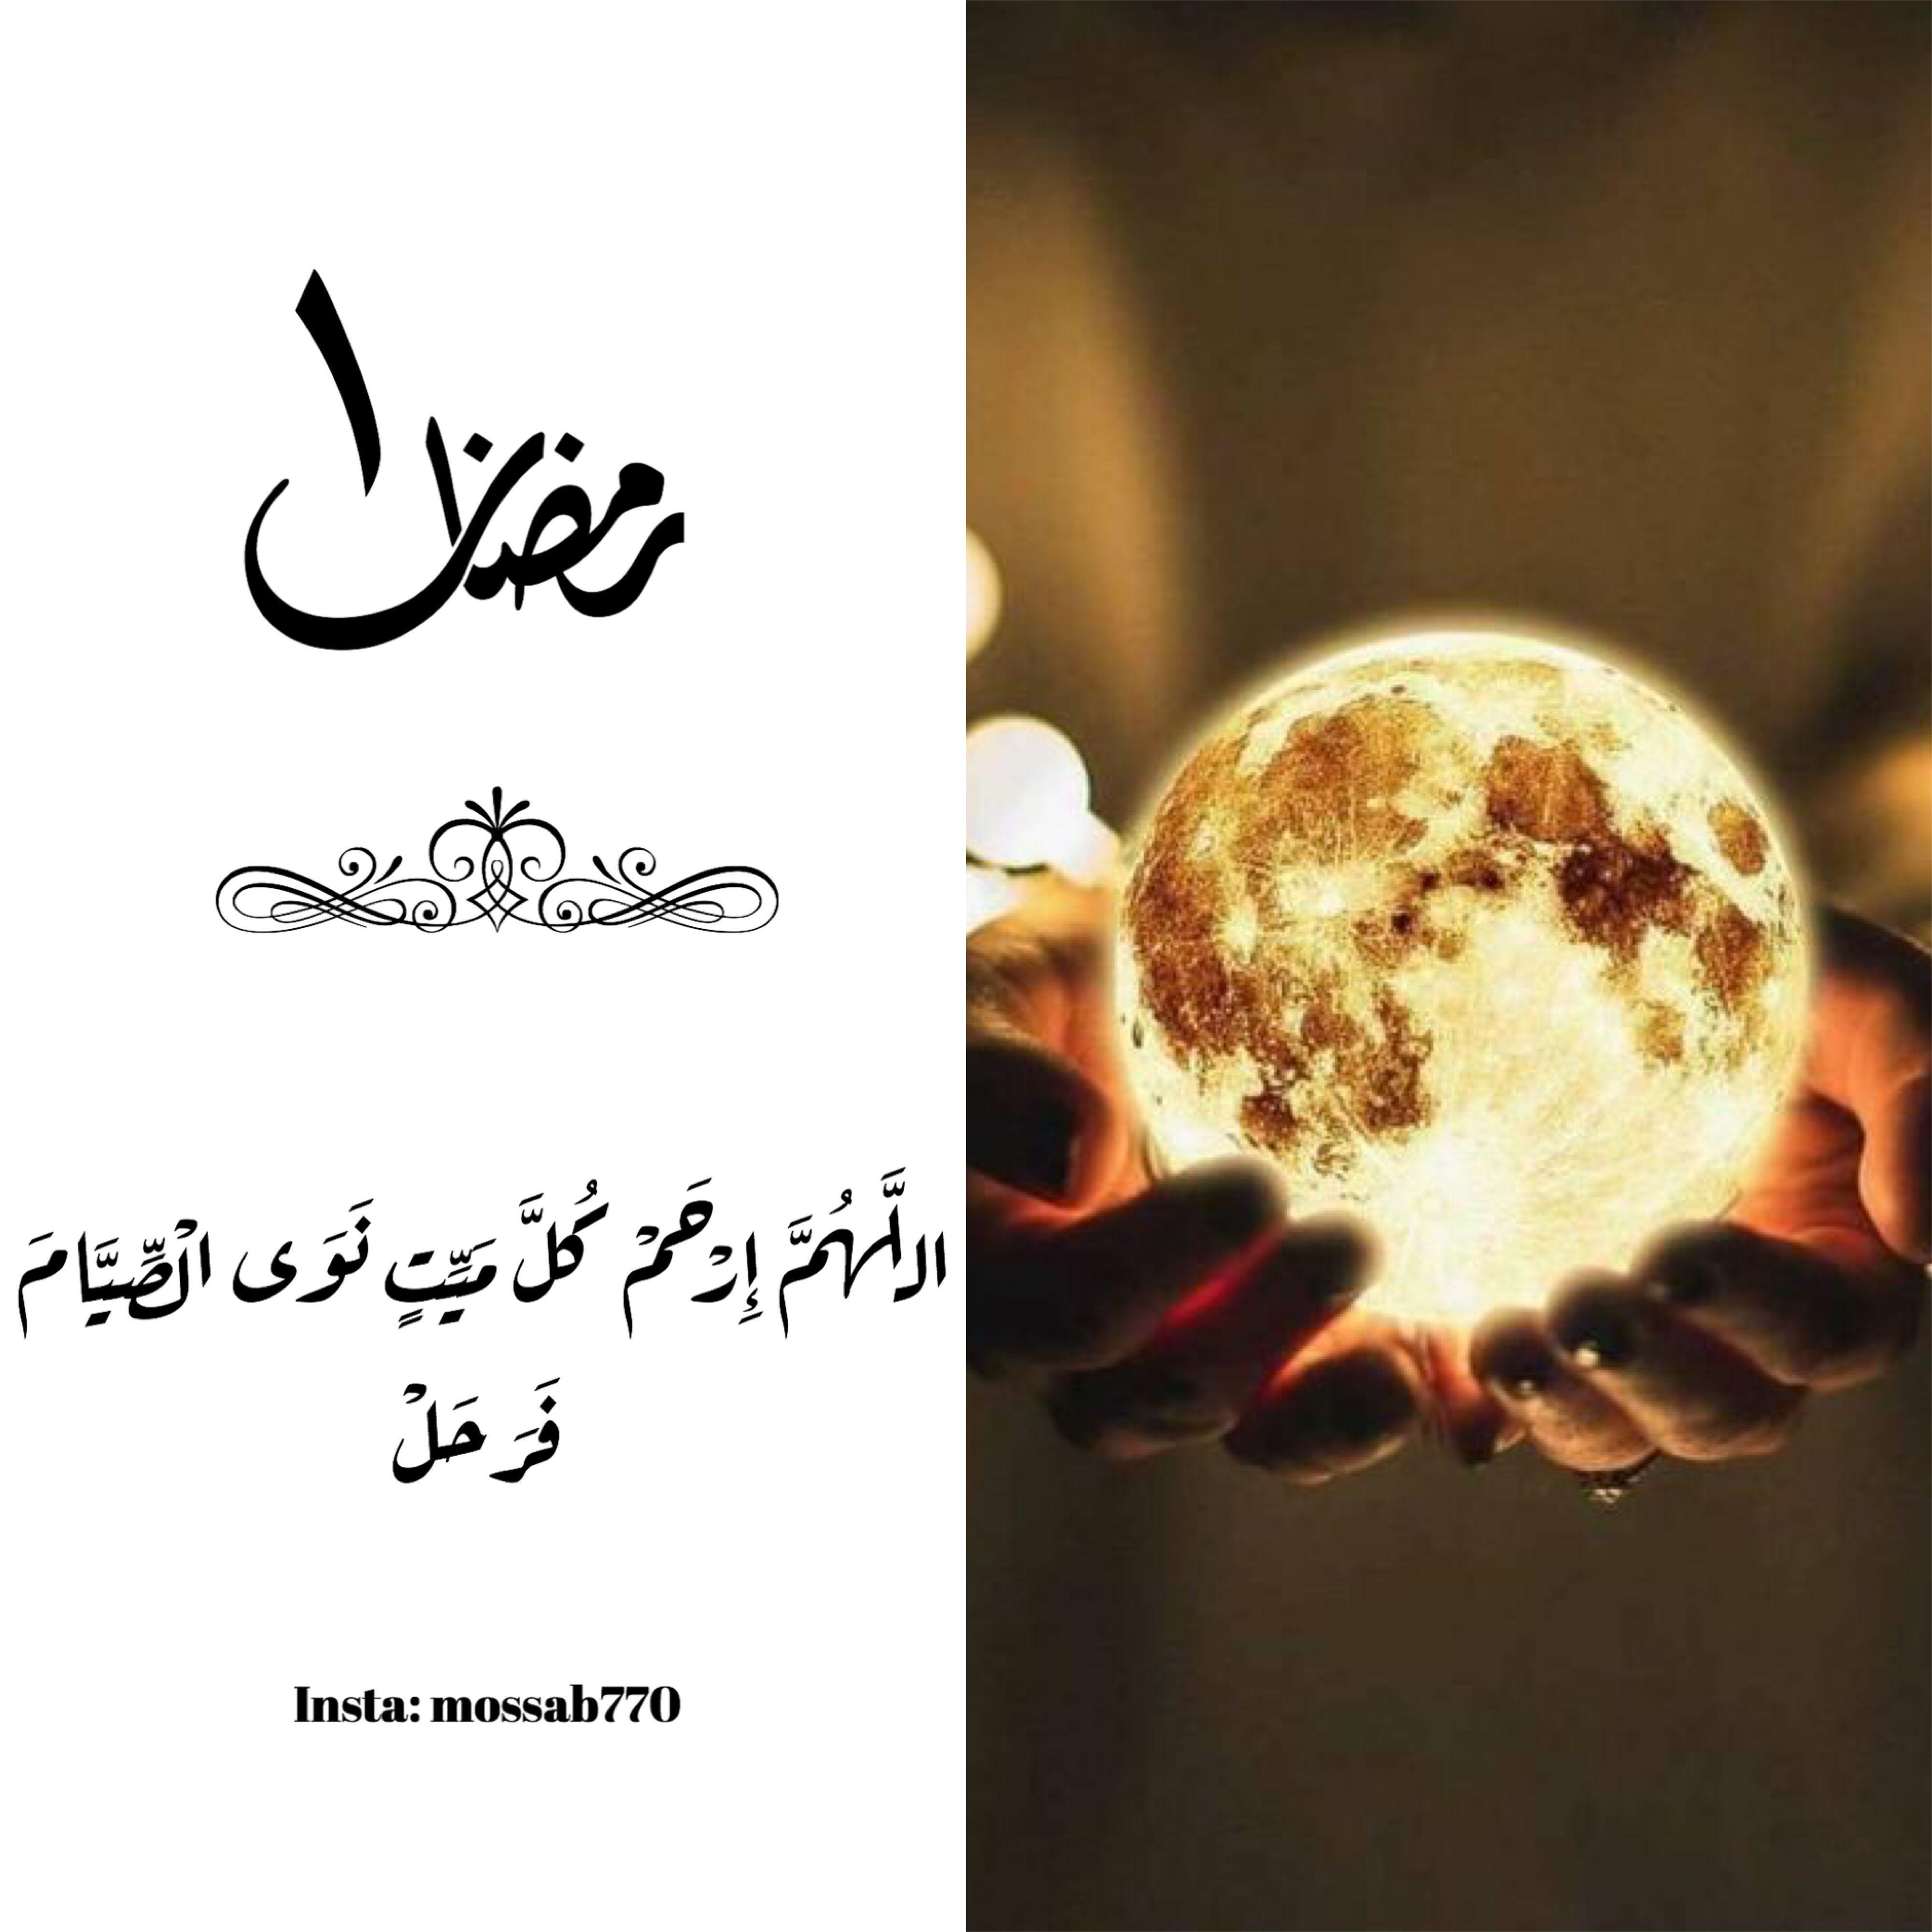 رمضان رمضان كريم رمزيات عبارات رمضانيات Celestial Bodies Body Celestial